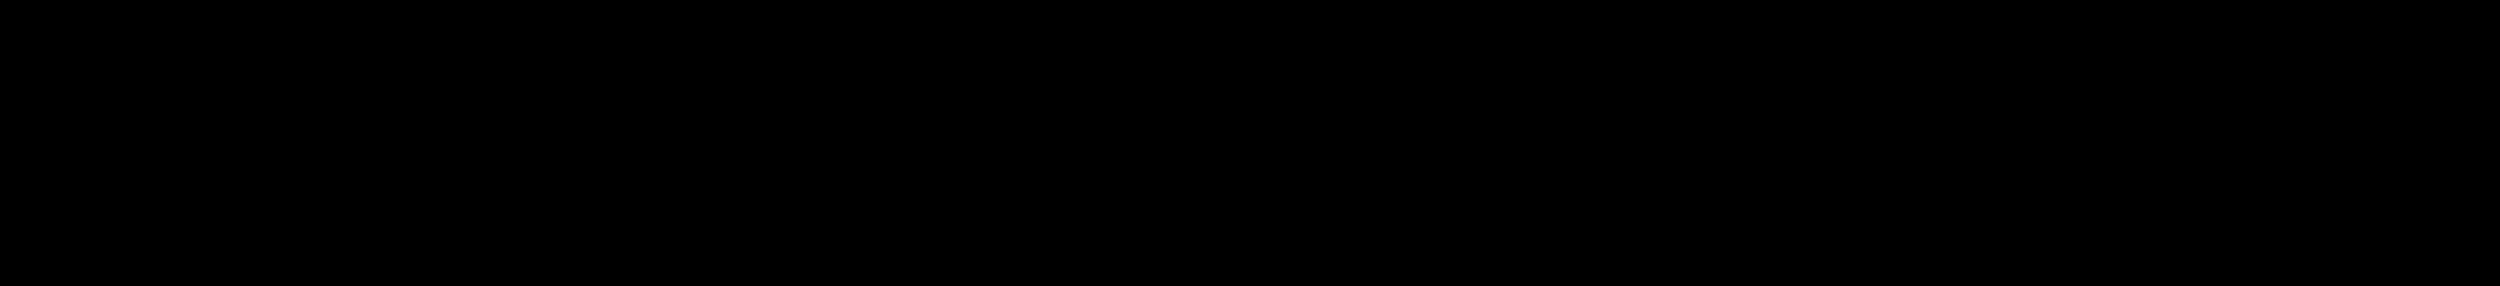 Shelby Logo black bar.png